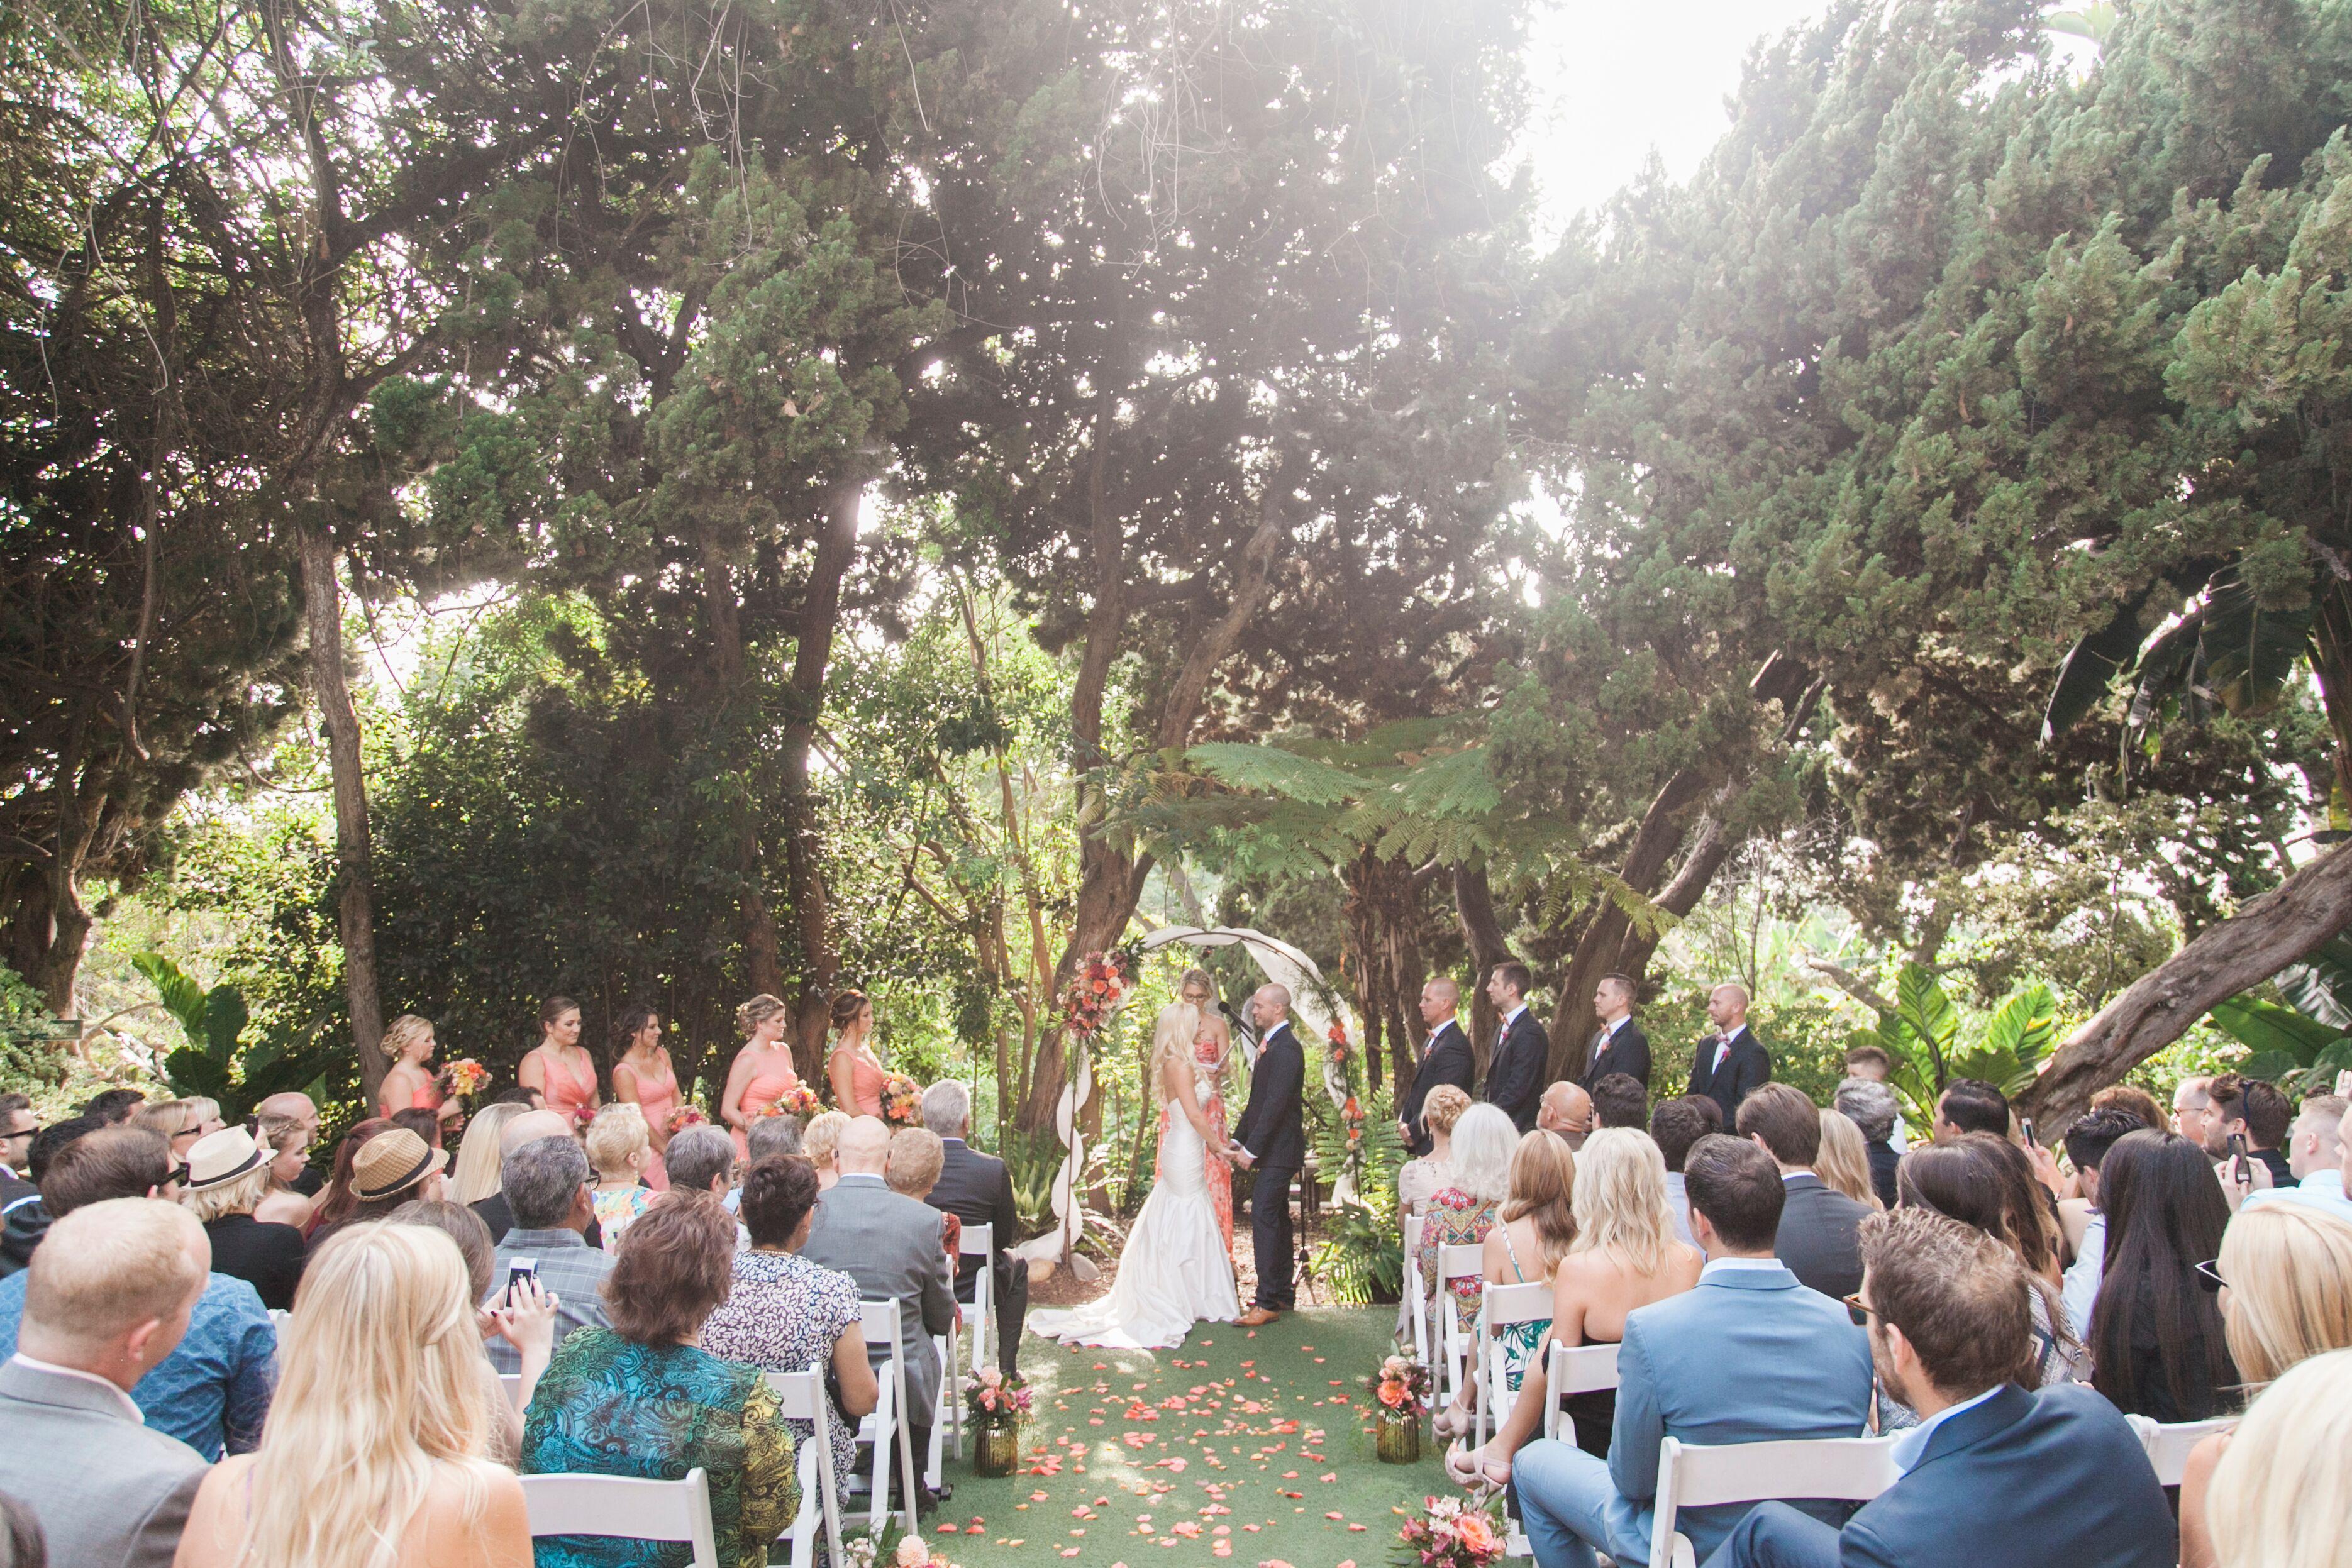 Outdoor Wedding Ceremony At San Diego Botanic Gardens